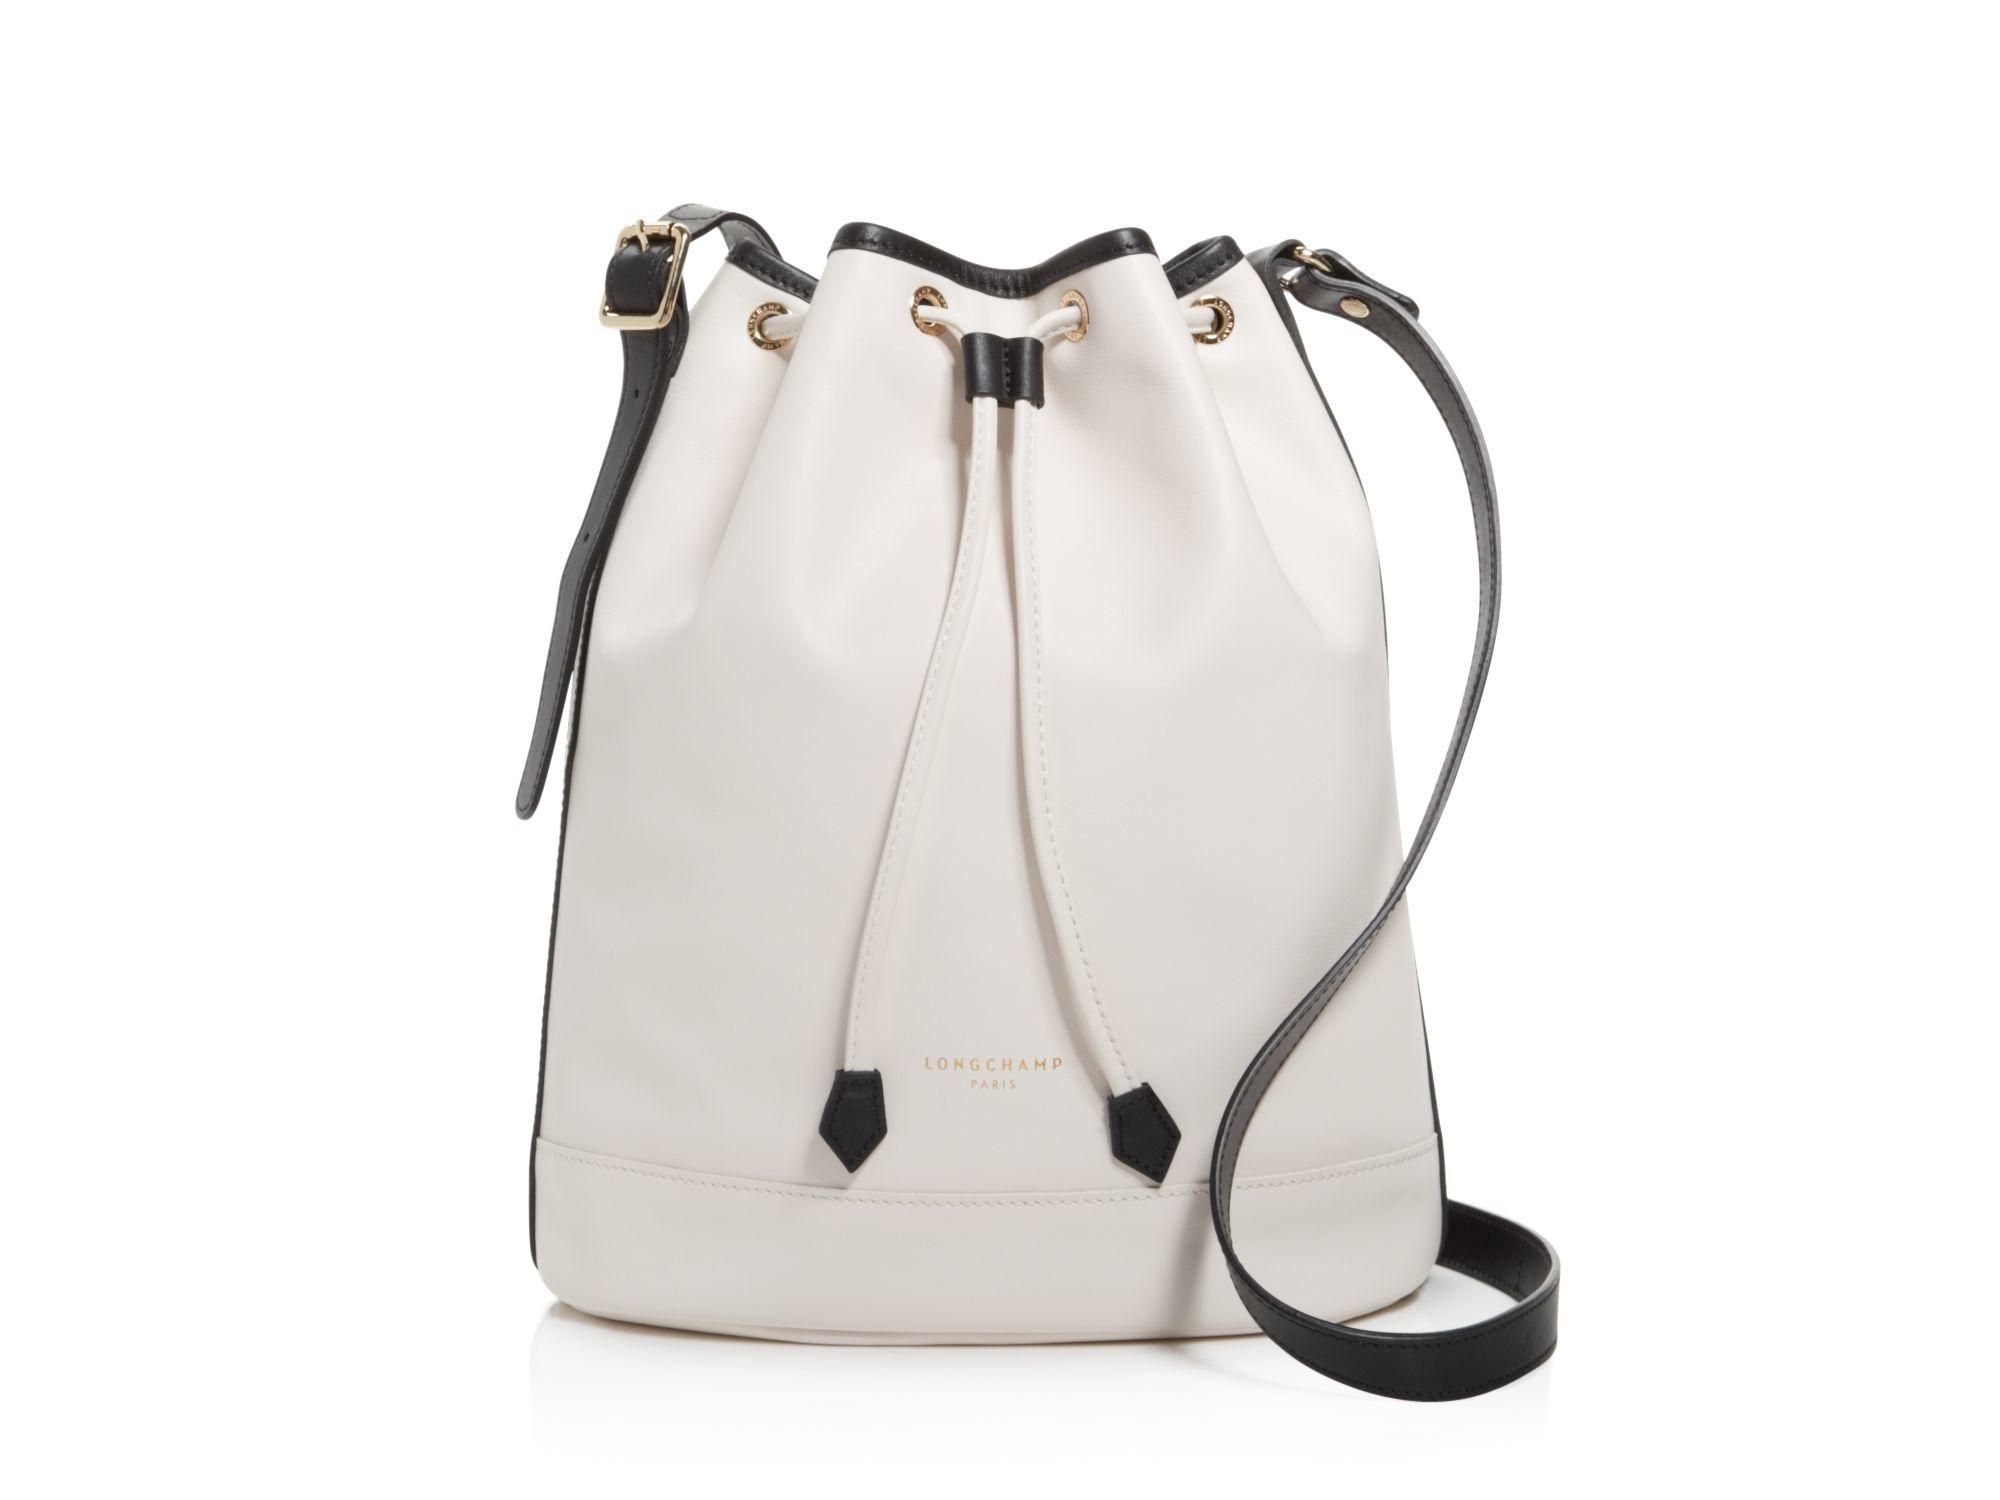 6a1fa5c8456 Lyst - Longchamp Medium 2.0 Bucket Bag in Natural